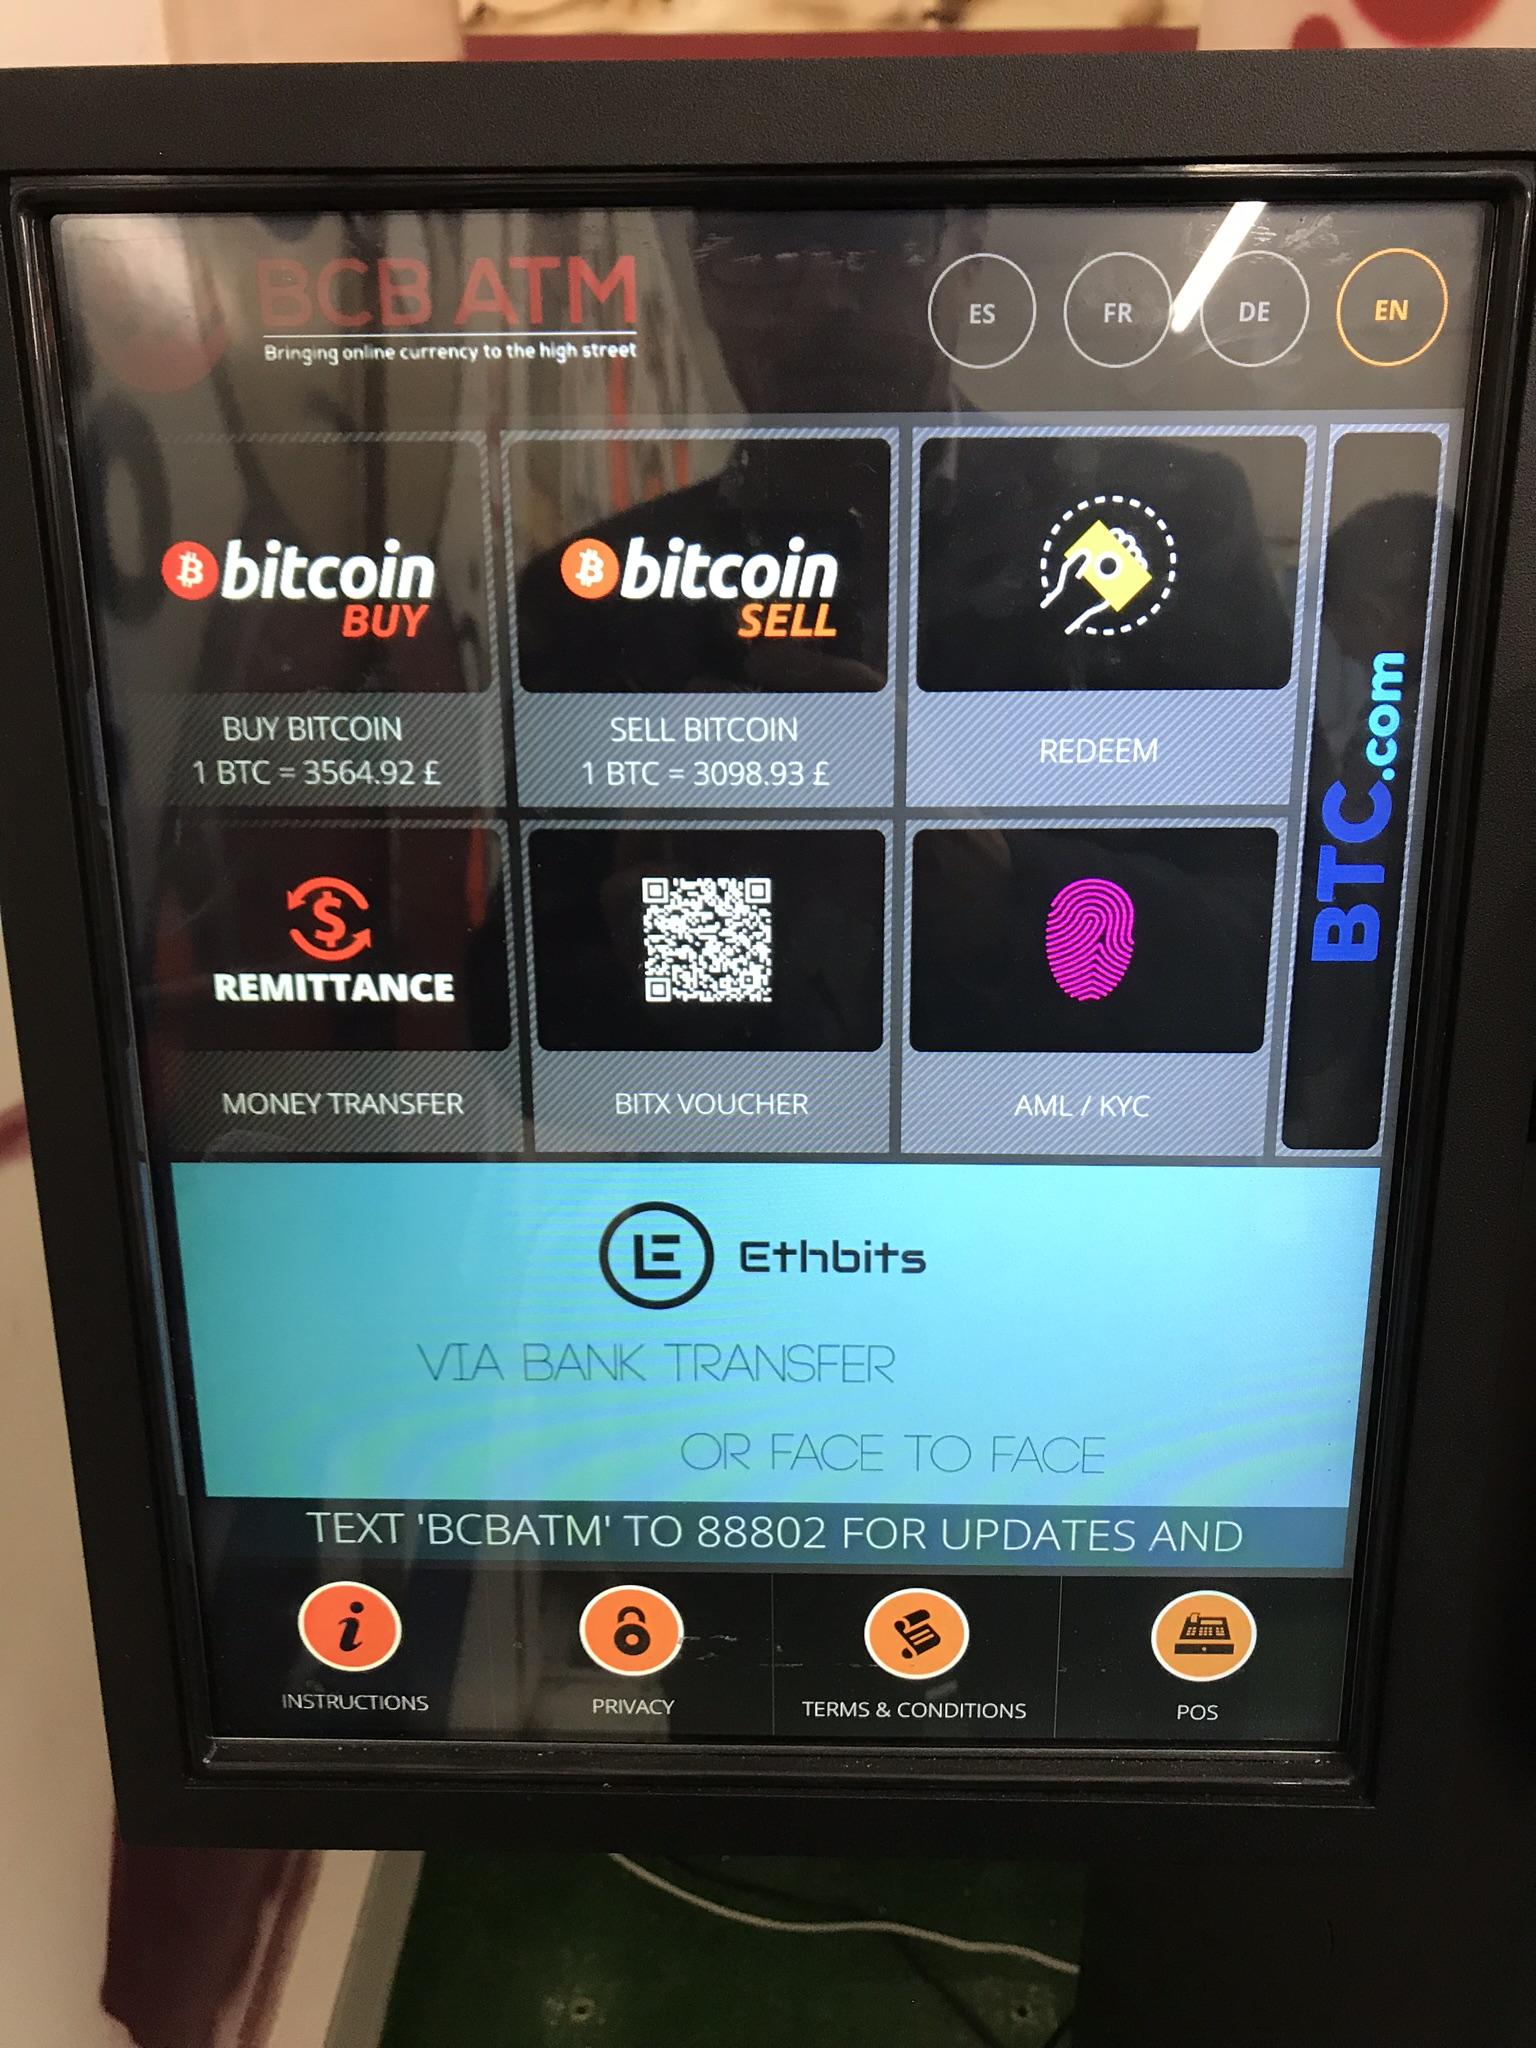 Bitcoin ATM BCB